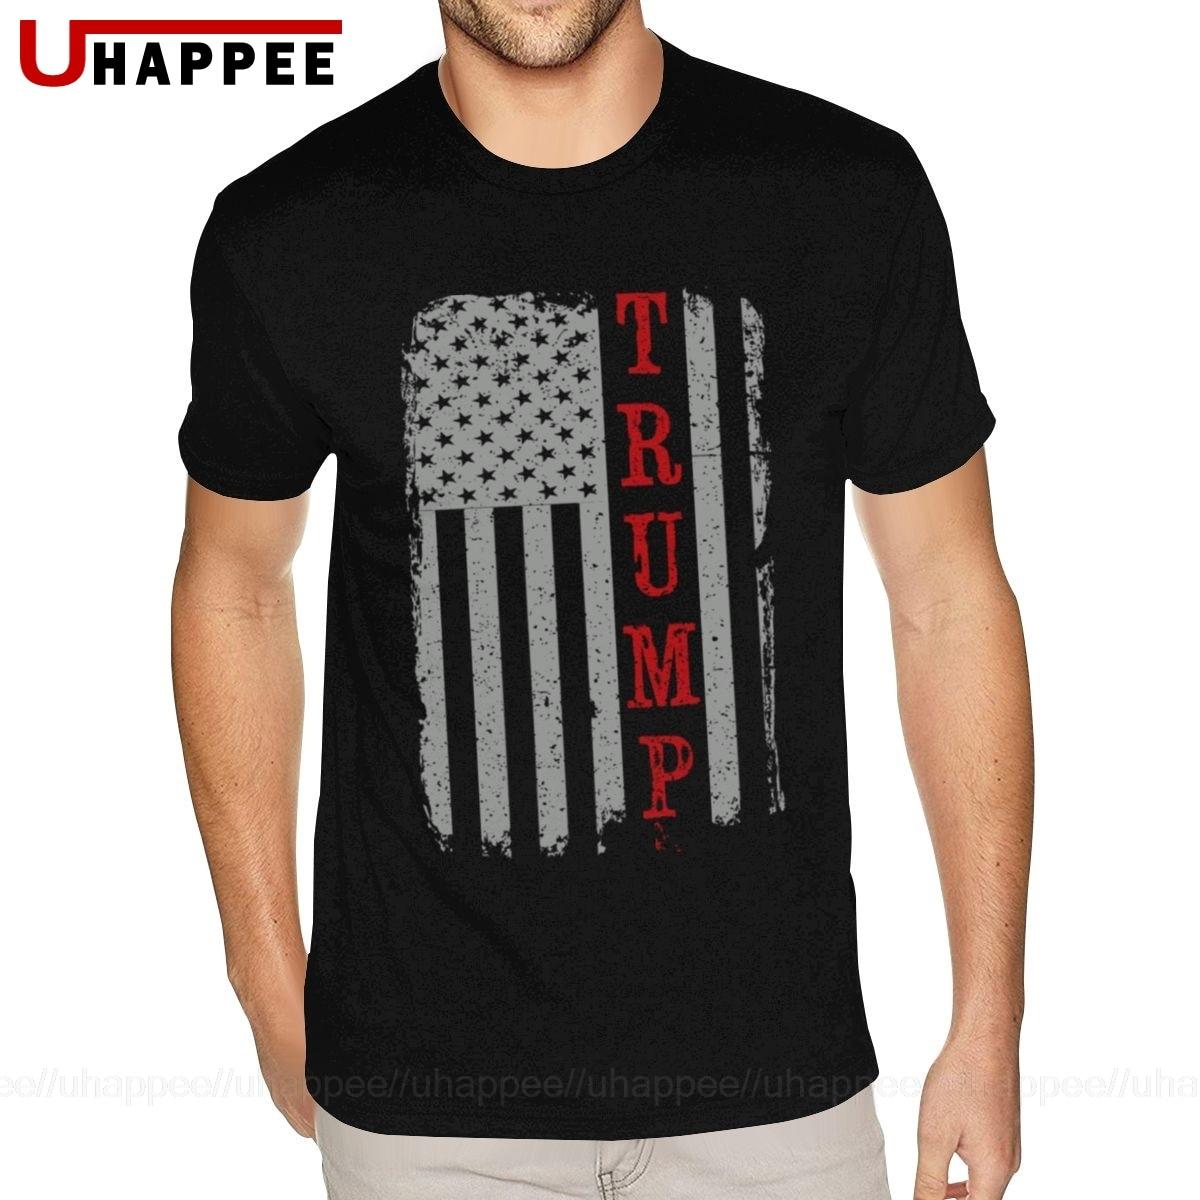 Donald J. Trump presidente-bandeira americana teesshirts juventude 2020 moda camisa masculina manga curta preço barato marca vestuário